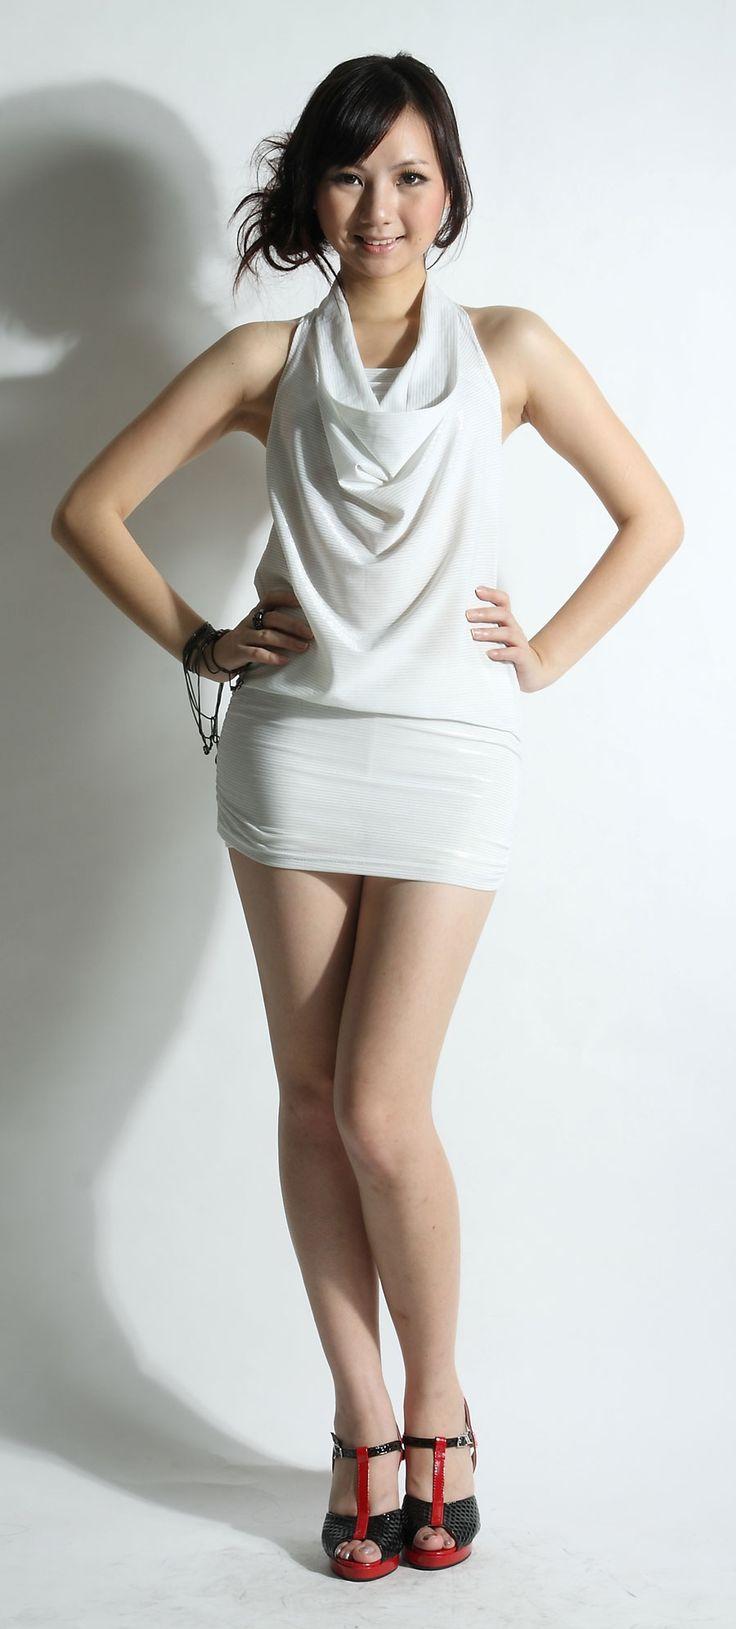 14 best miniskirts images on Pinterest